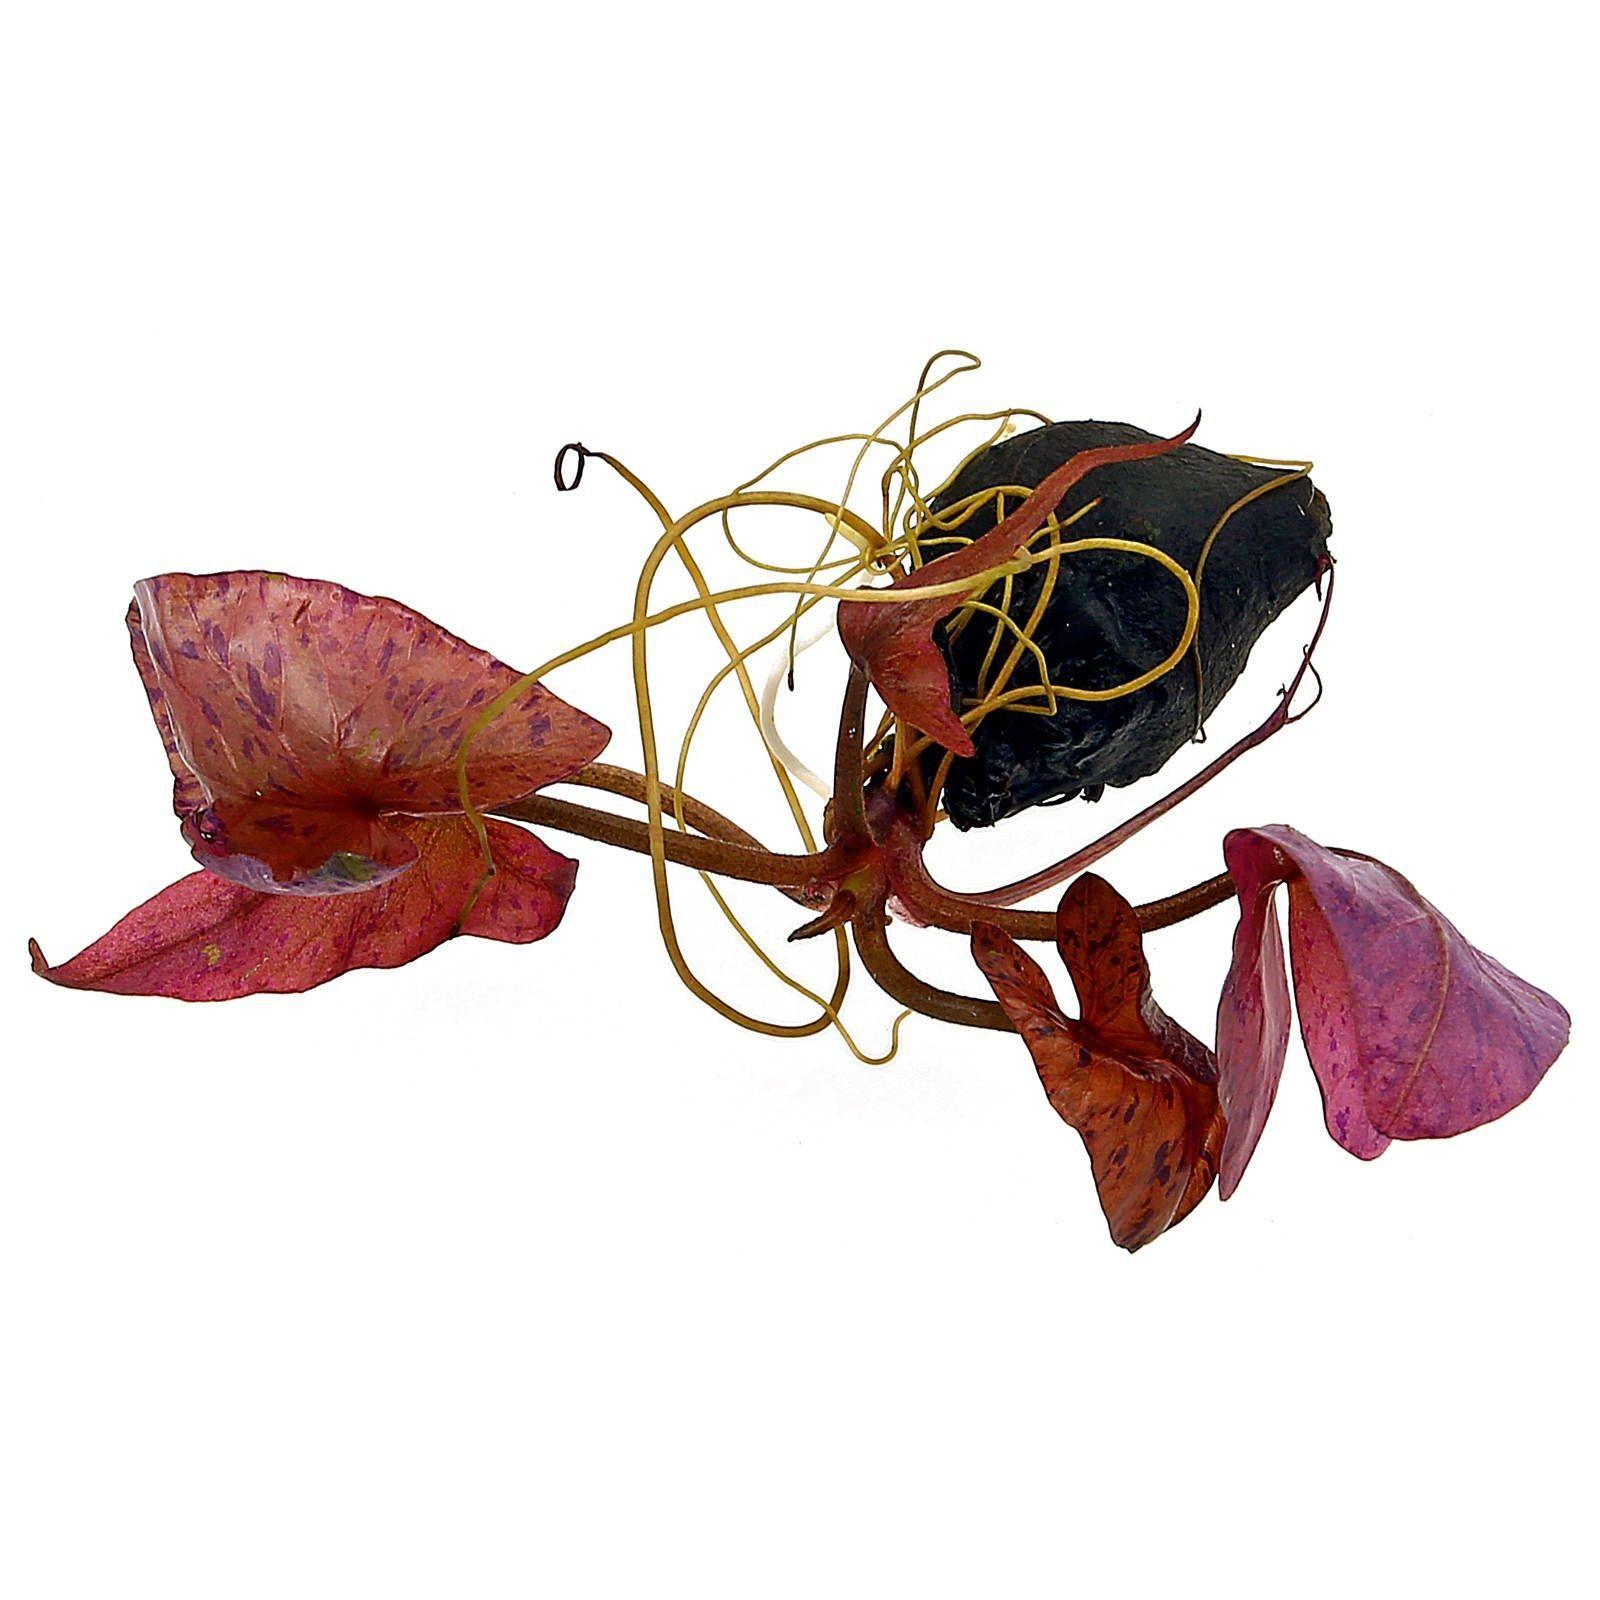 Nymphea lotus åkande